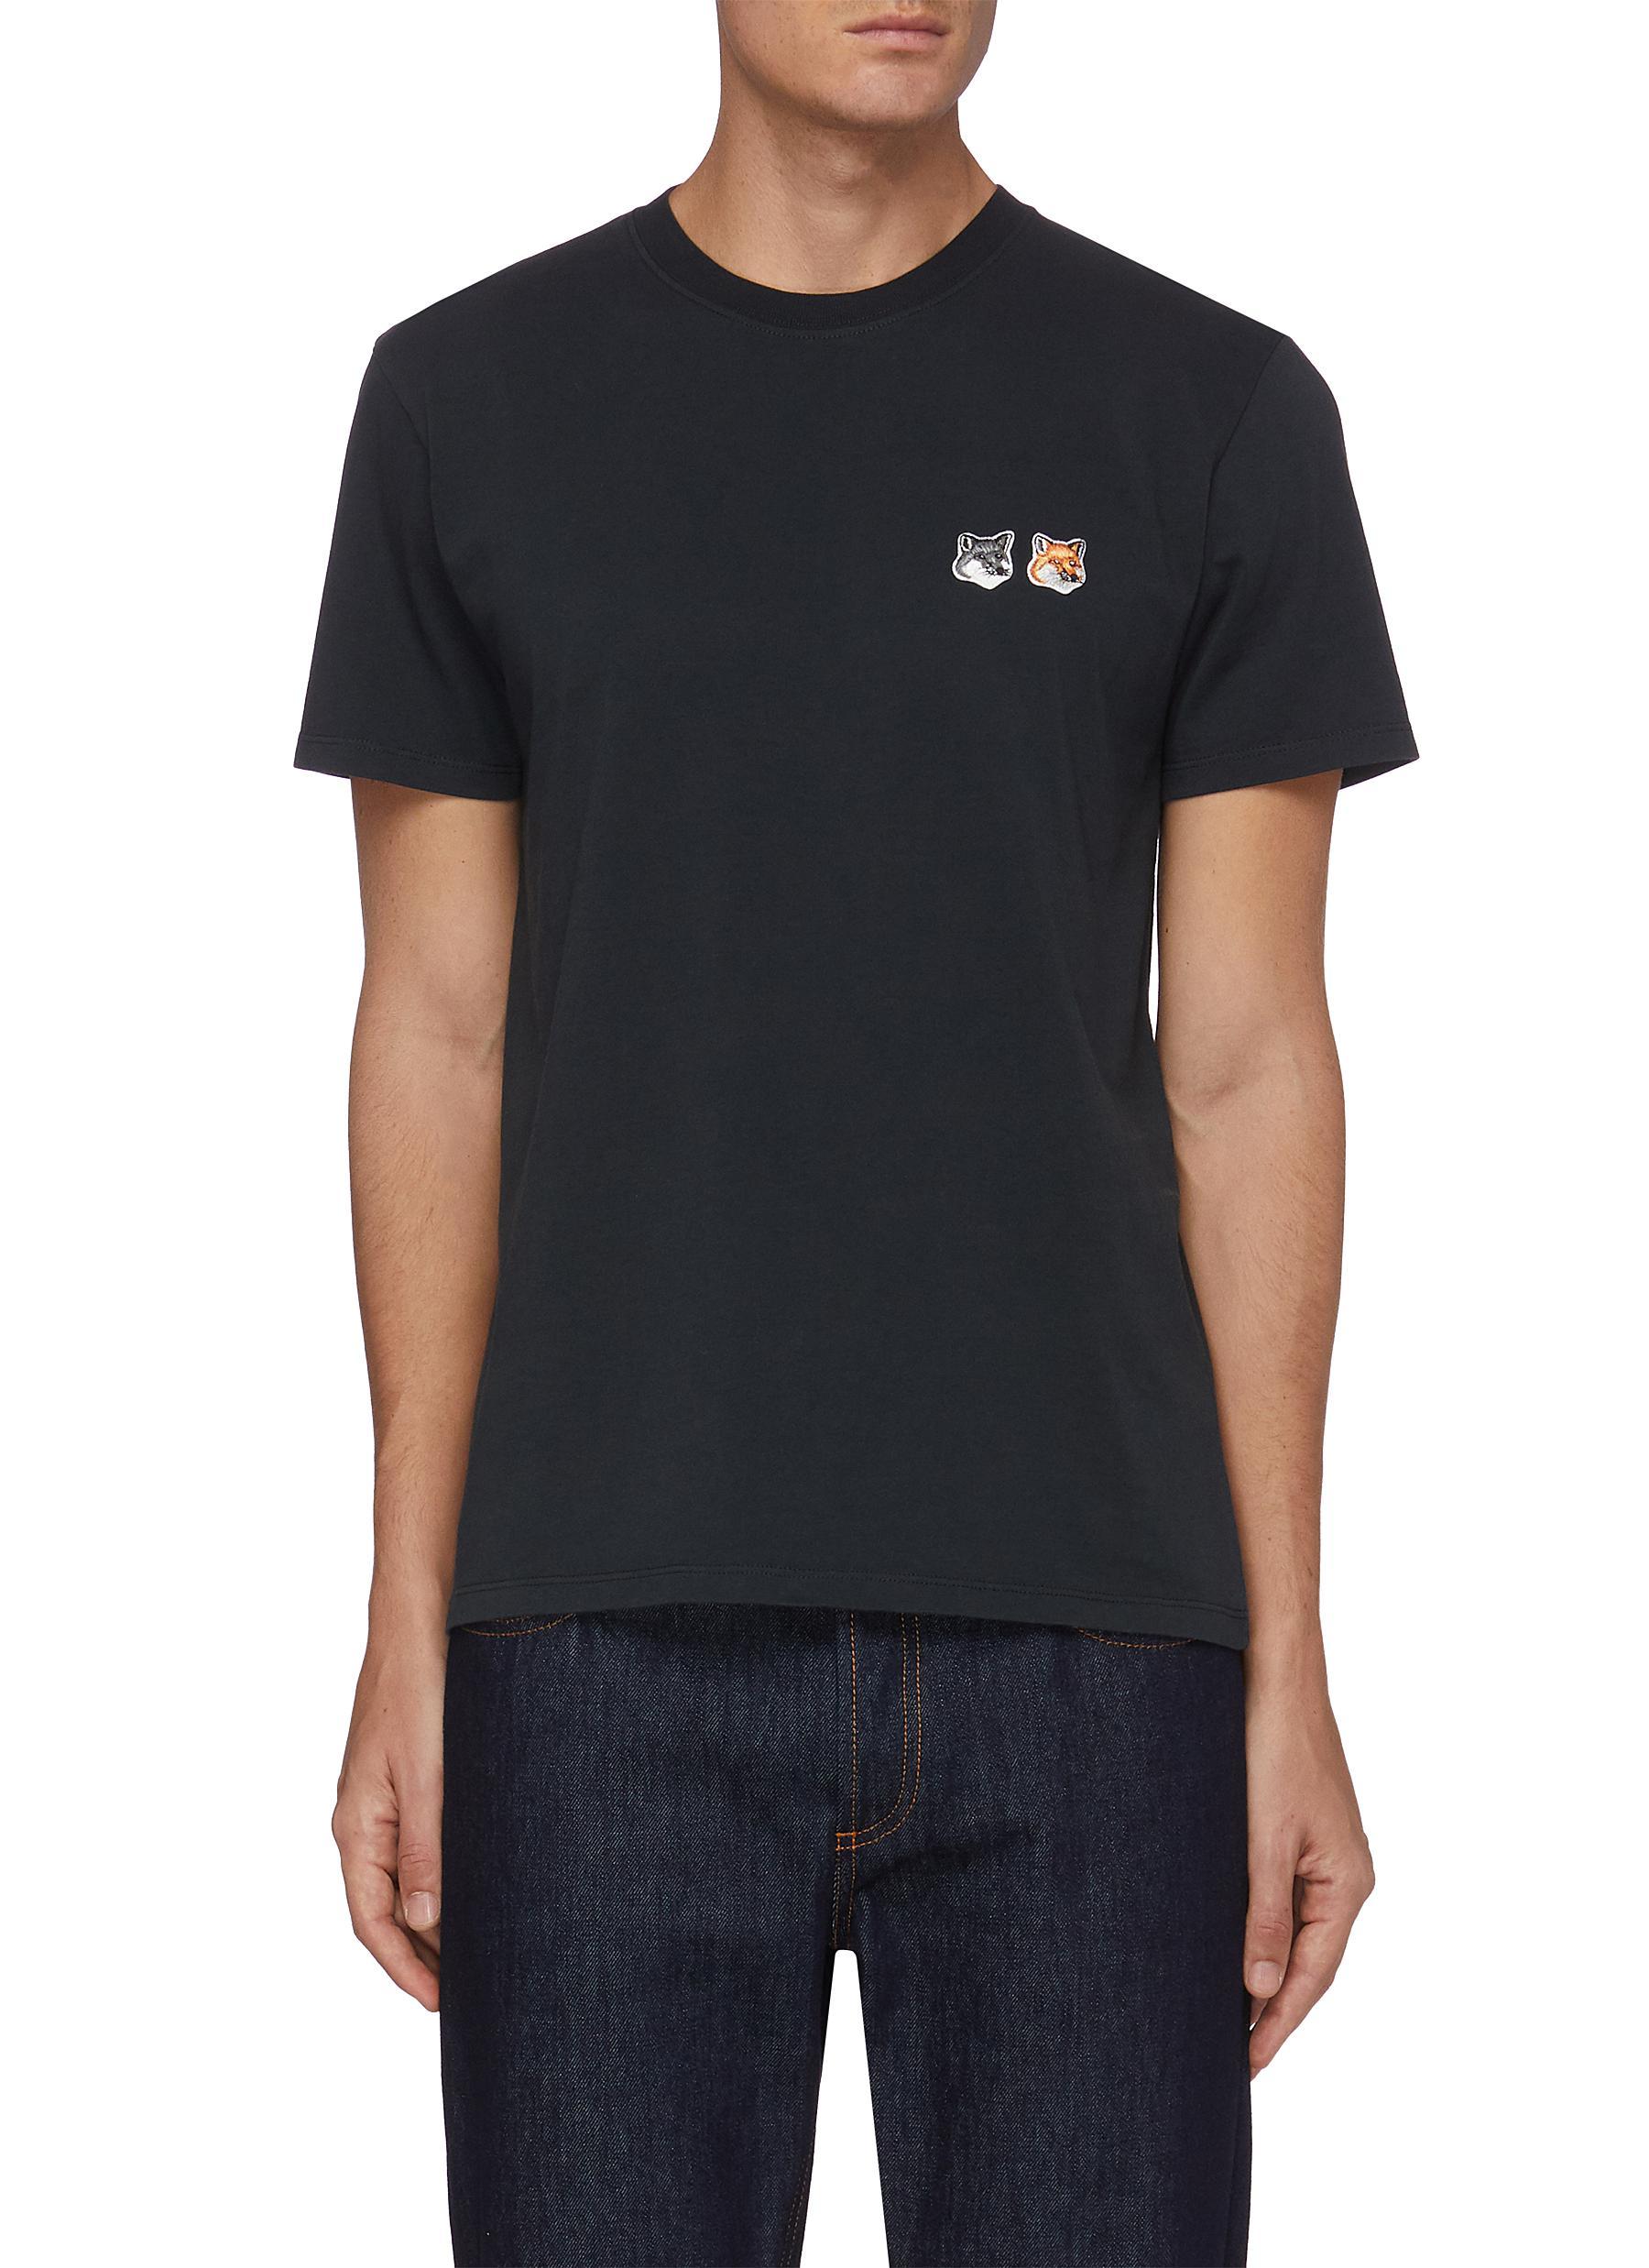 Double Fox Head Patch T-Shirt - MAISON KITSUNÉ - Modalova